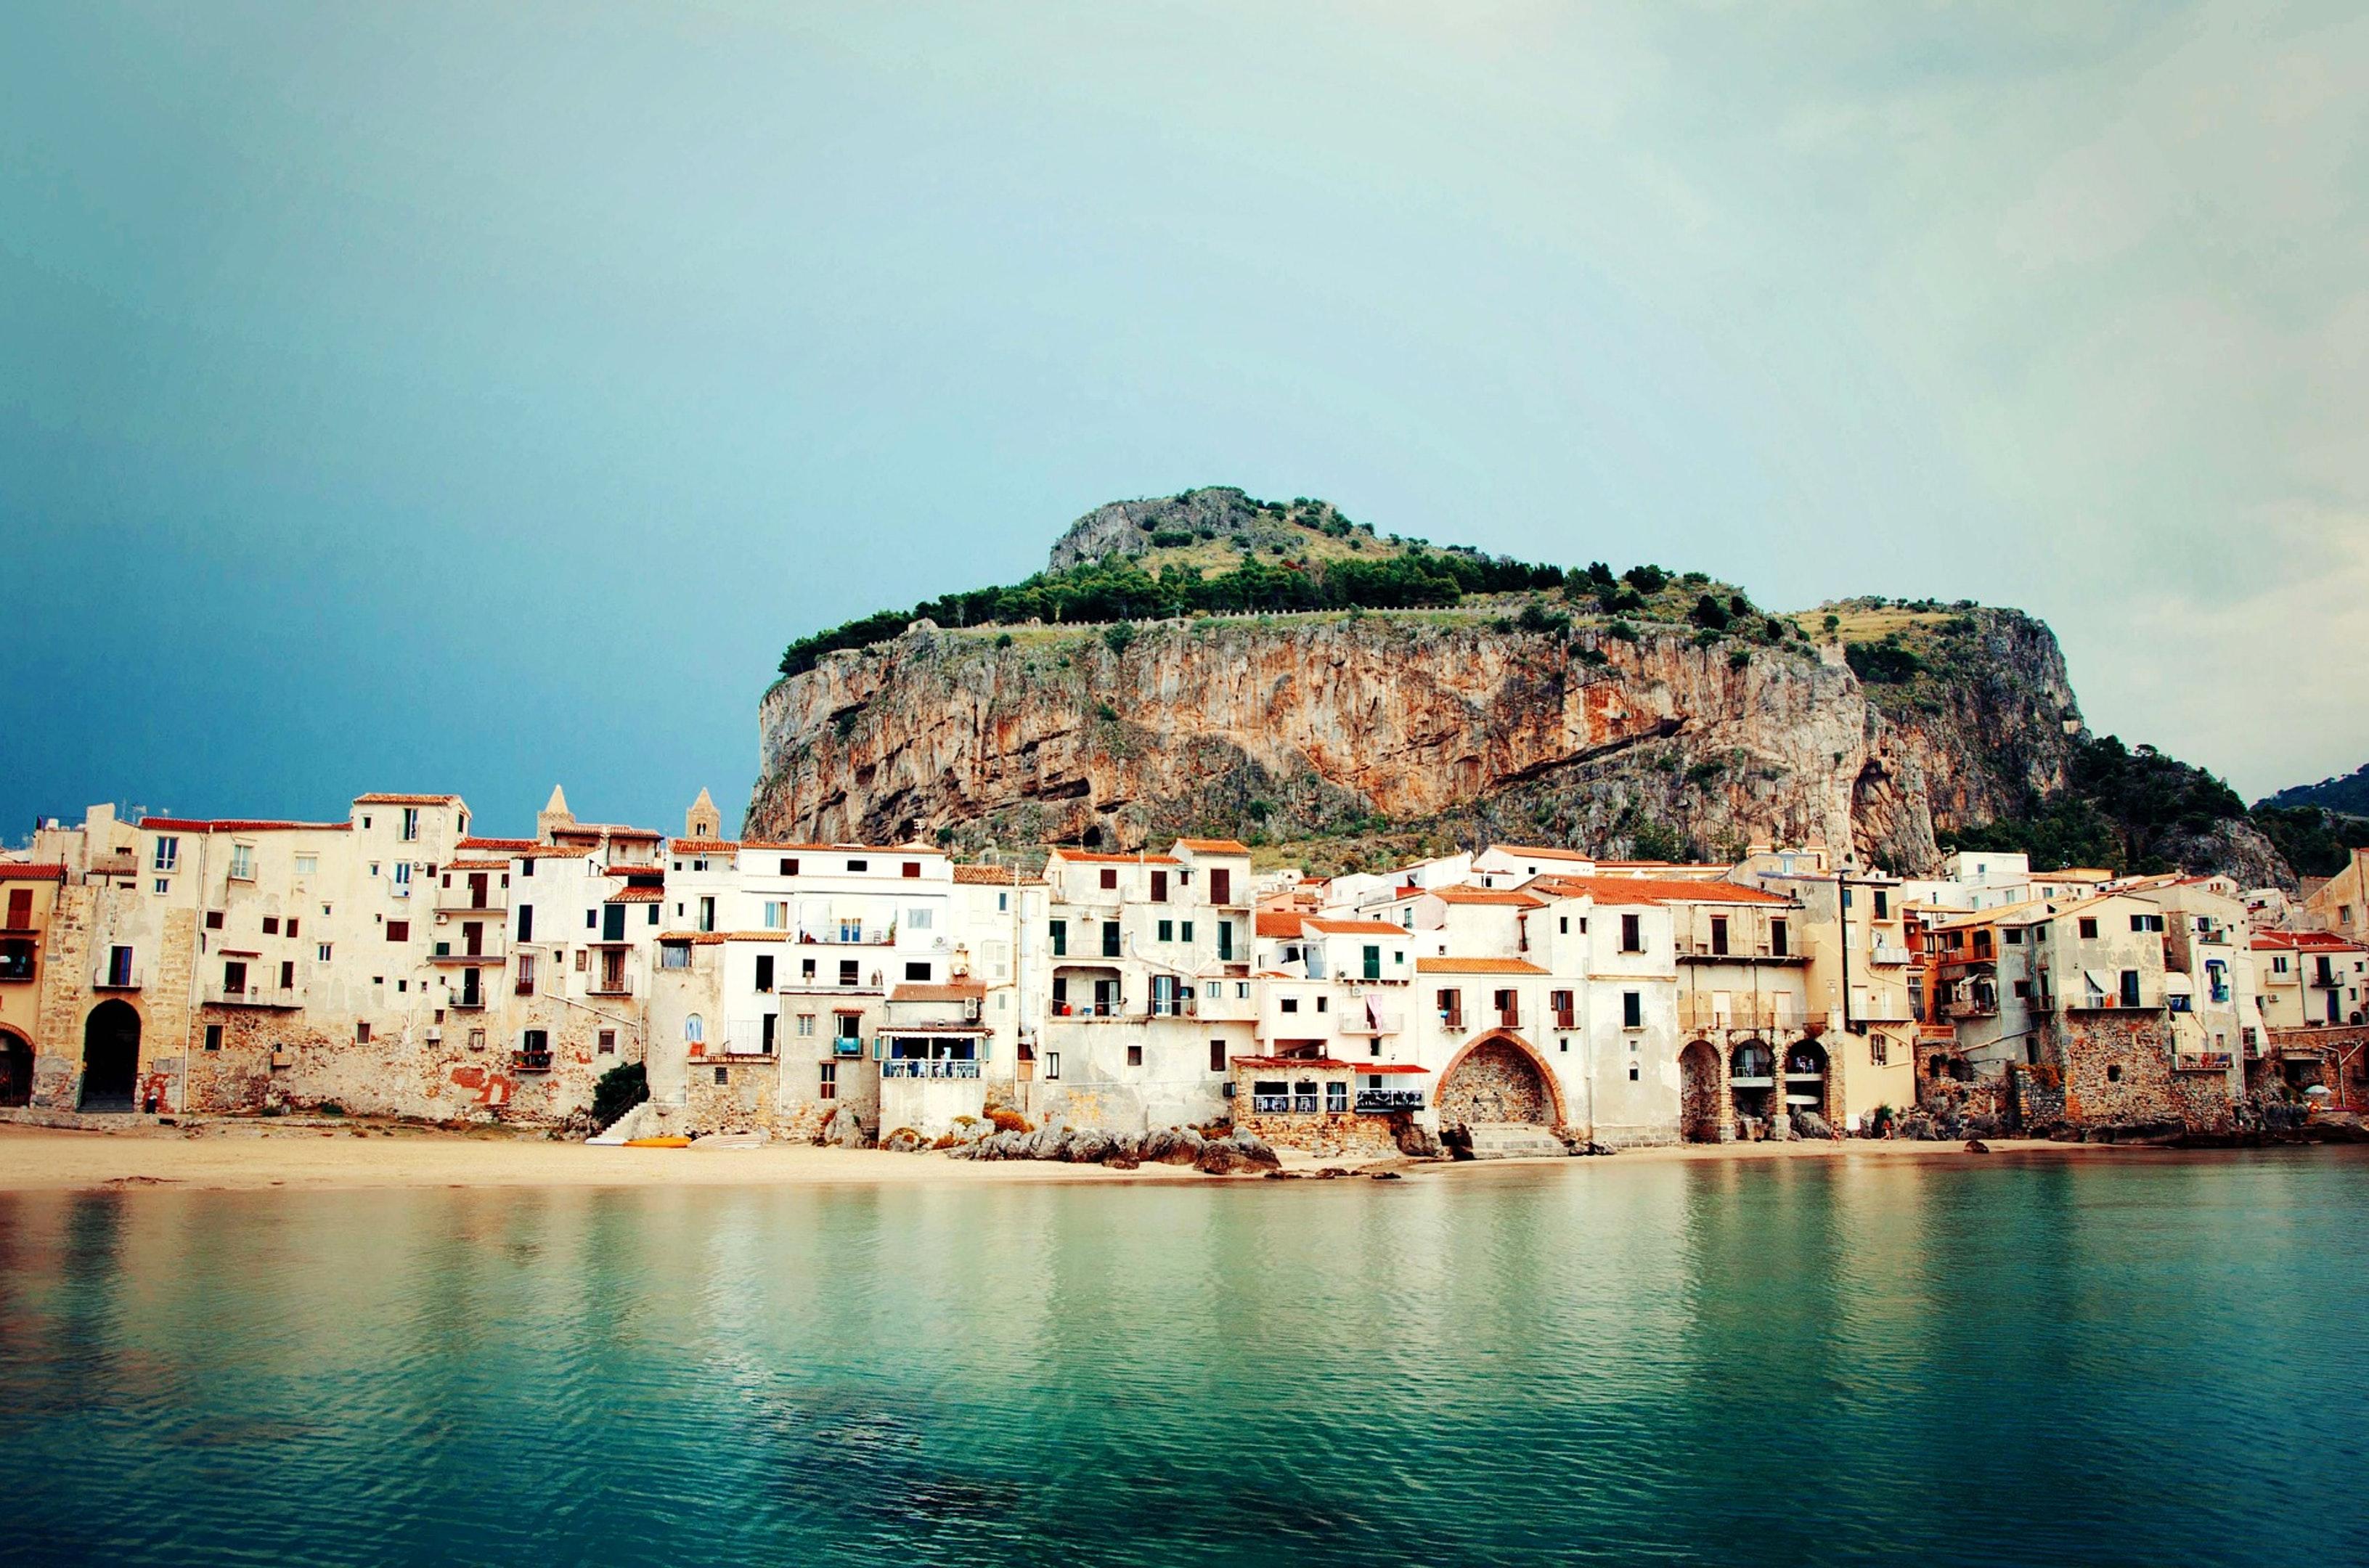 Appartement de vacances Studio in Campofelice di Roccella - 1 km vom Strand entfernt (2489579), Campofelice di Roccella, Palermo, Sicile, Italie, image 14